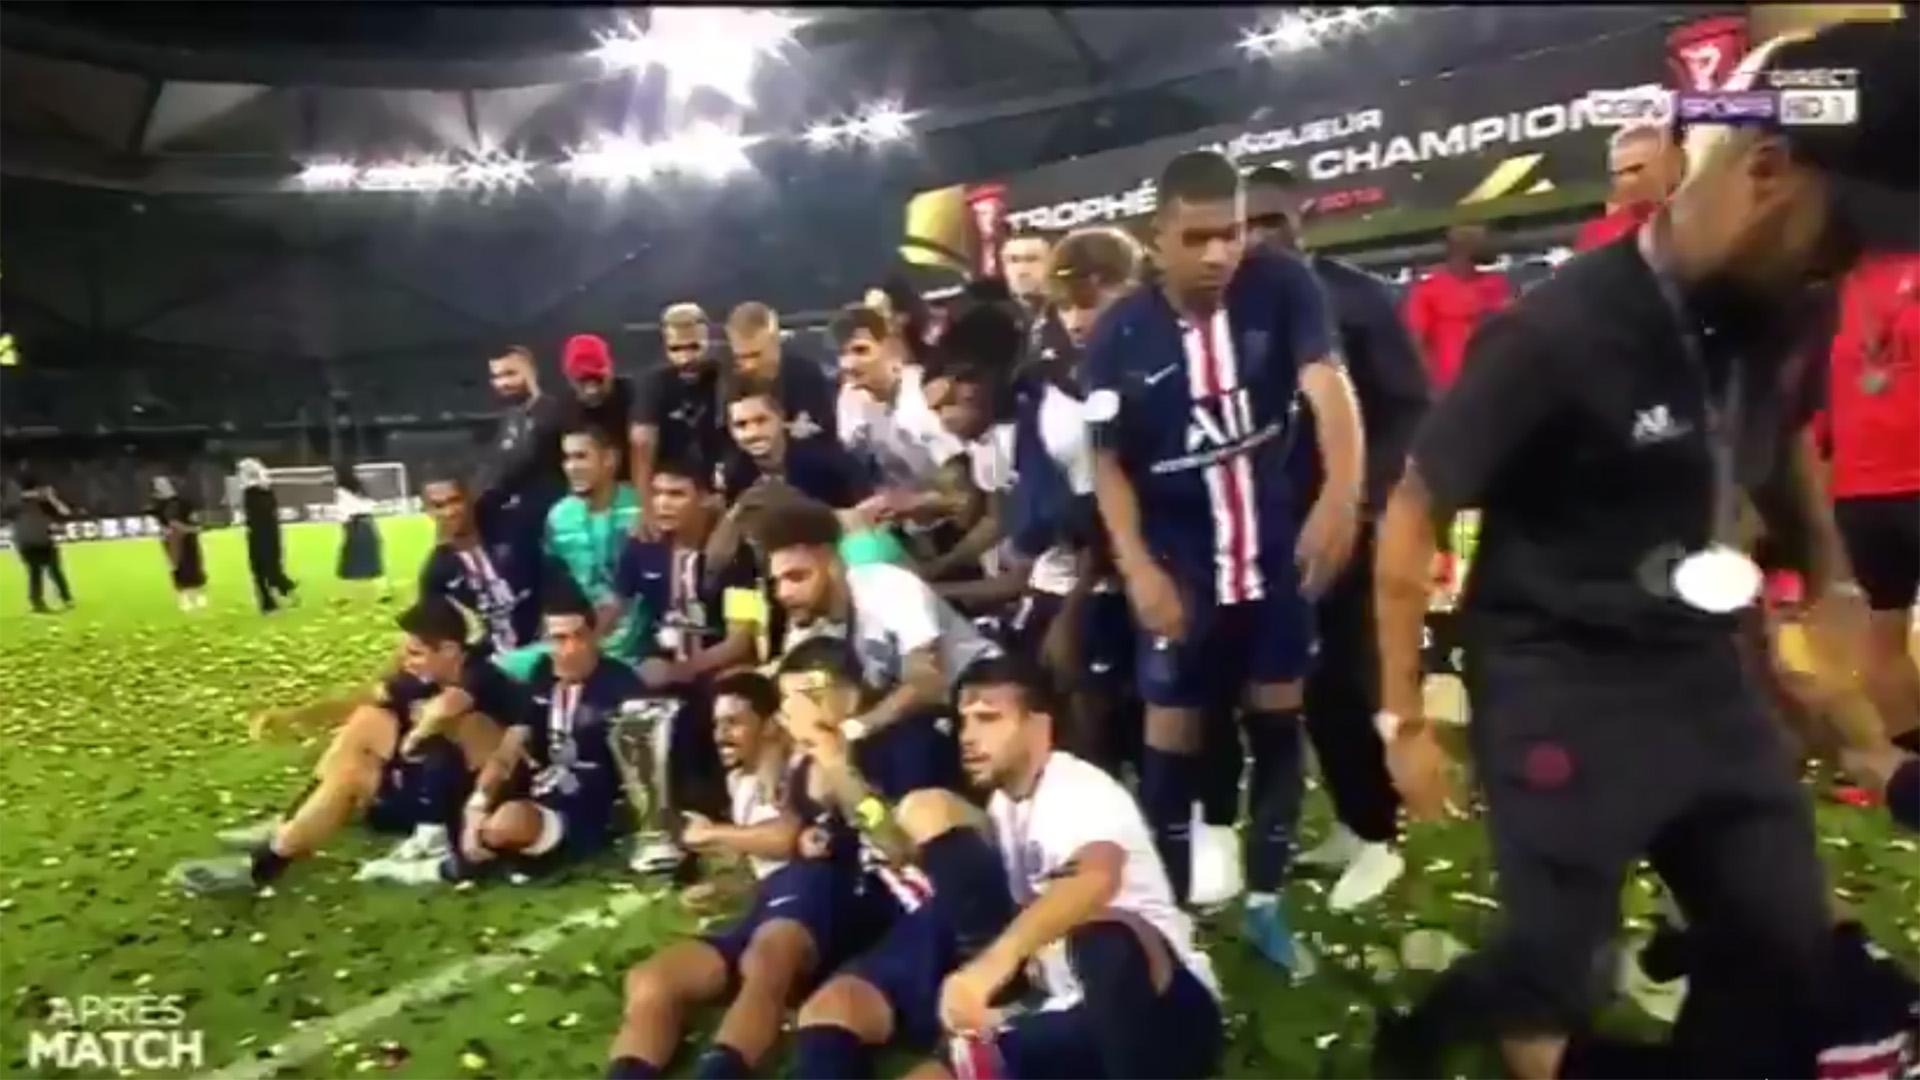 Neymar Kylian Mbappe PSG Trophee des Champions 2019